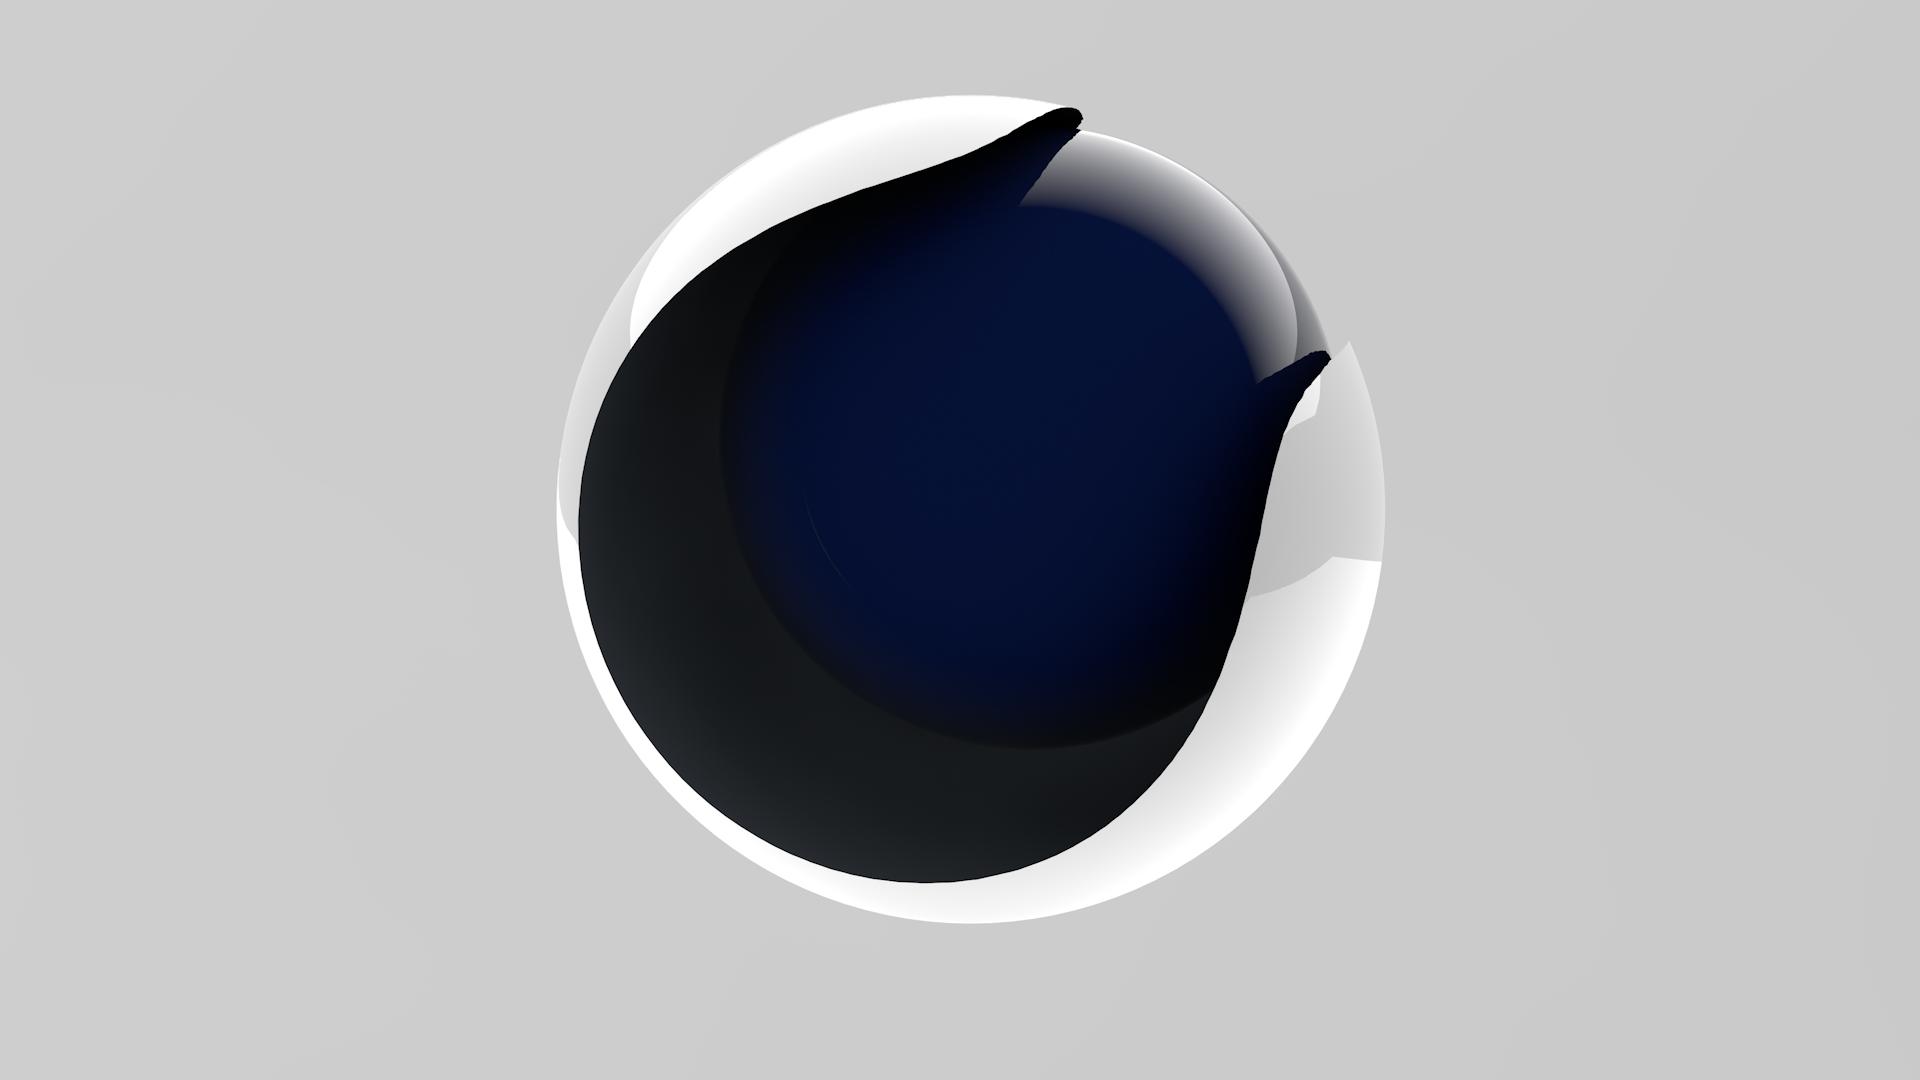 Wallpaper : digital art, 3D, sphere, logo, circle, Cinema 4D